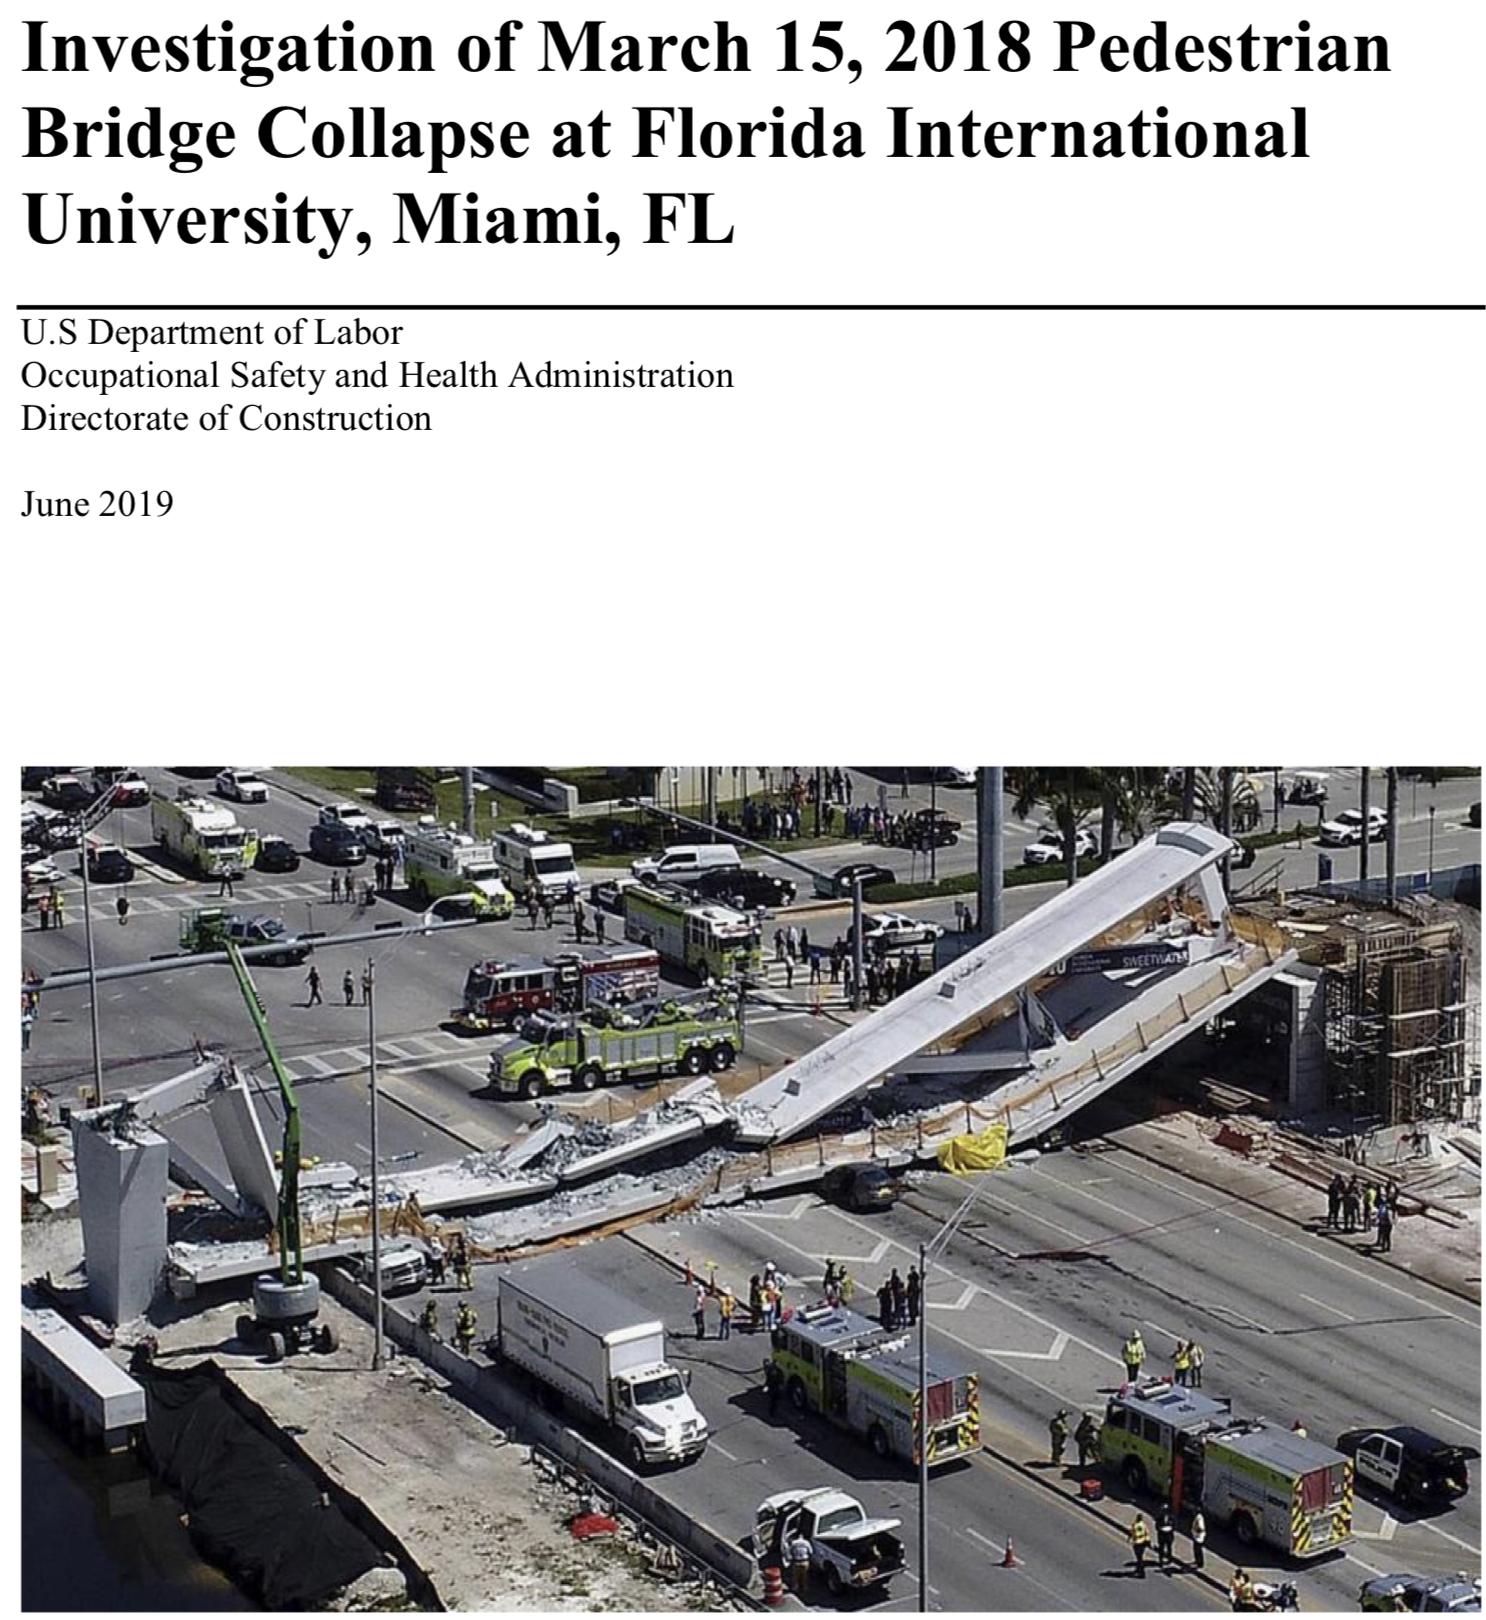 OSHA says faulty engineering caused FIU bridge collapse